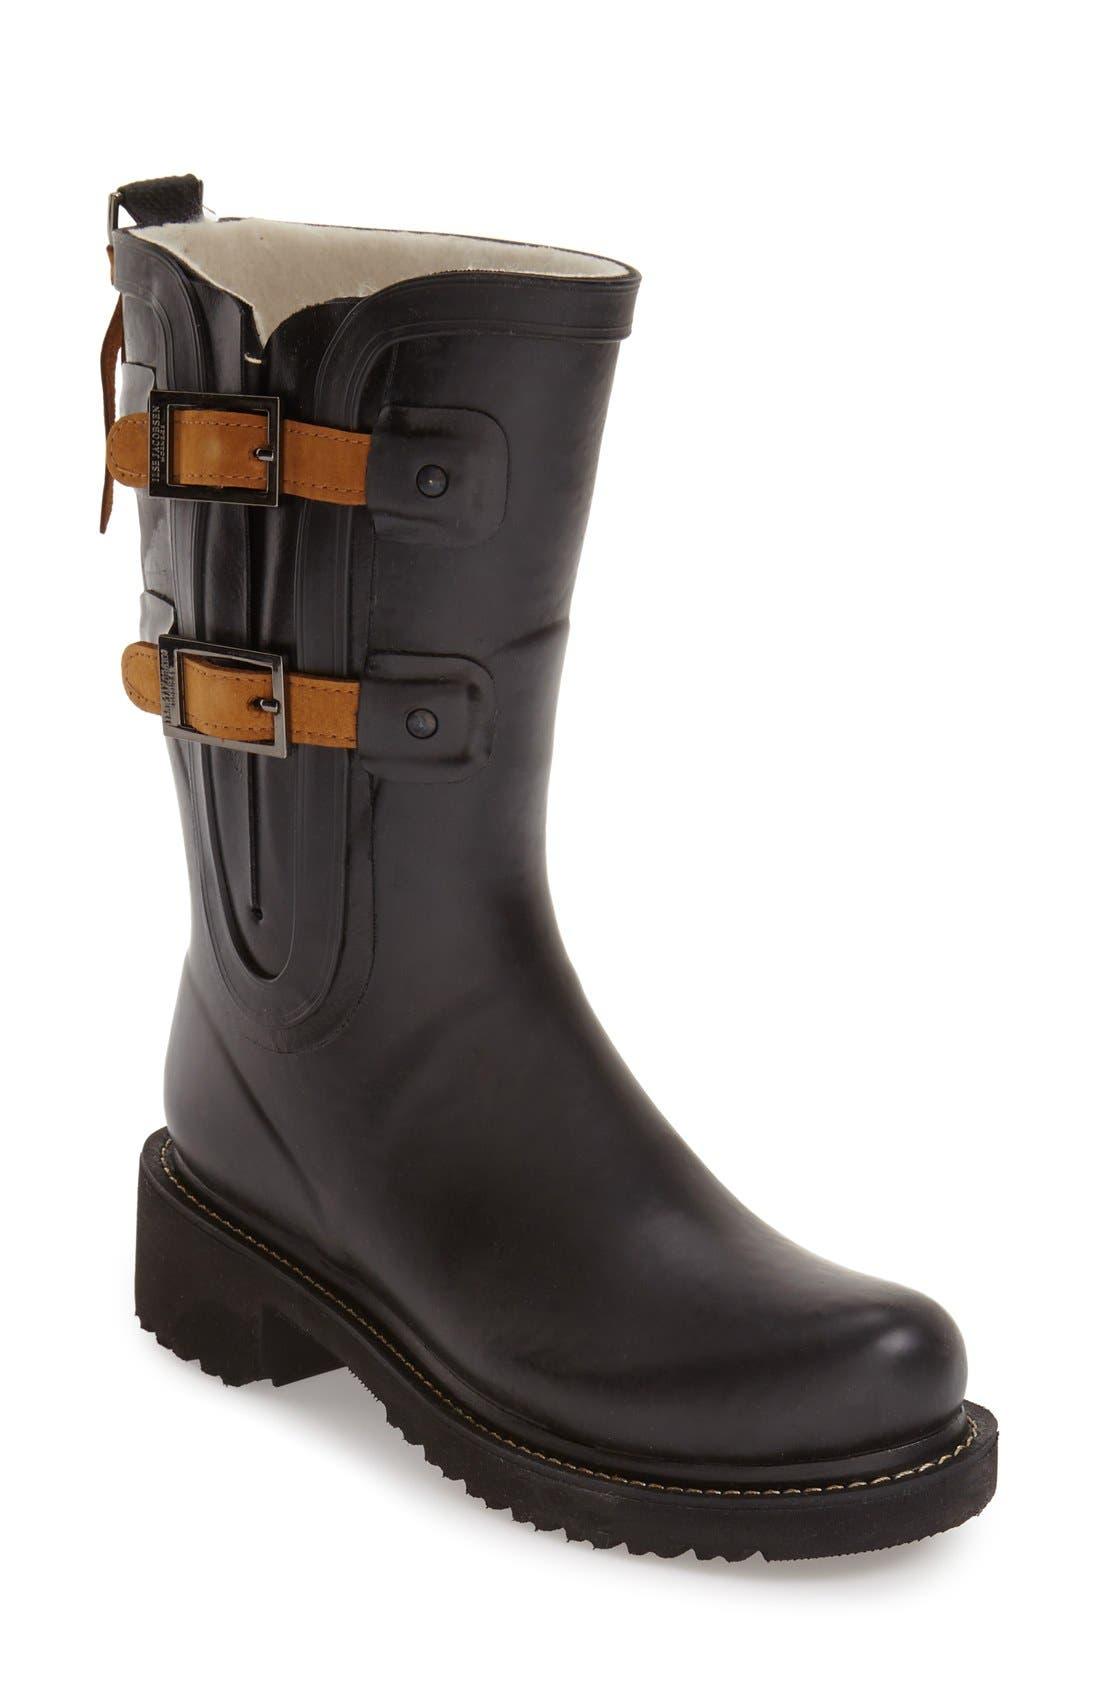 Waterproof Buckle Detail Snow/Rain Boot,                             Main thumbnail 1, color,                             BLACK